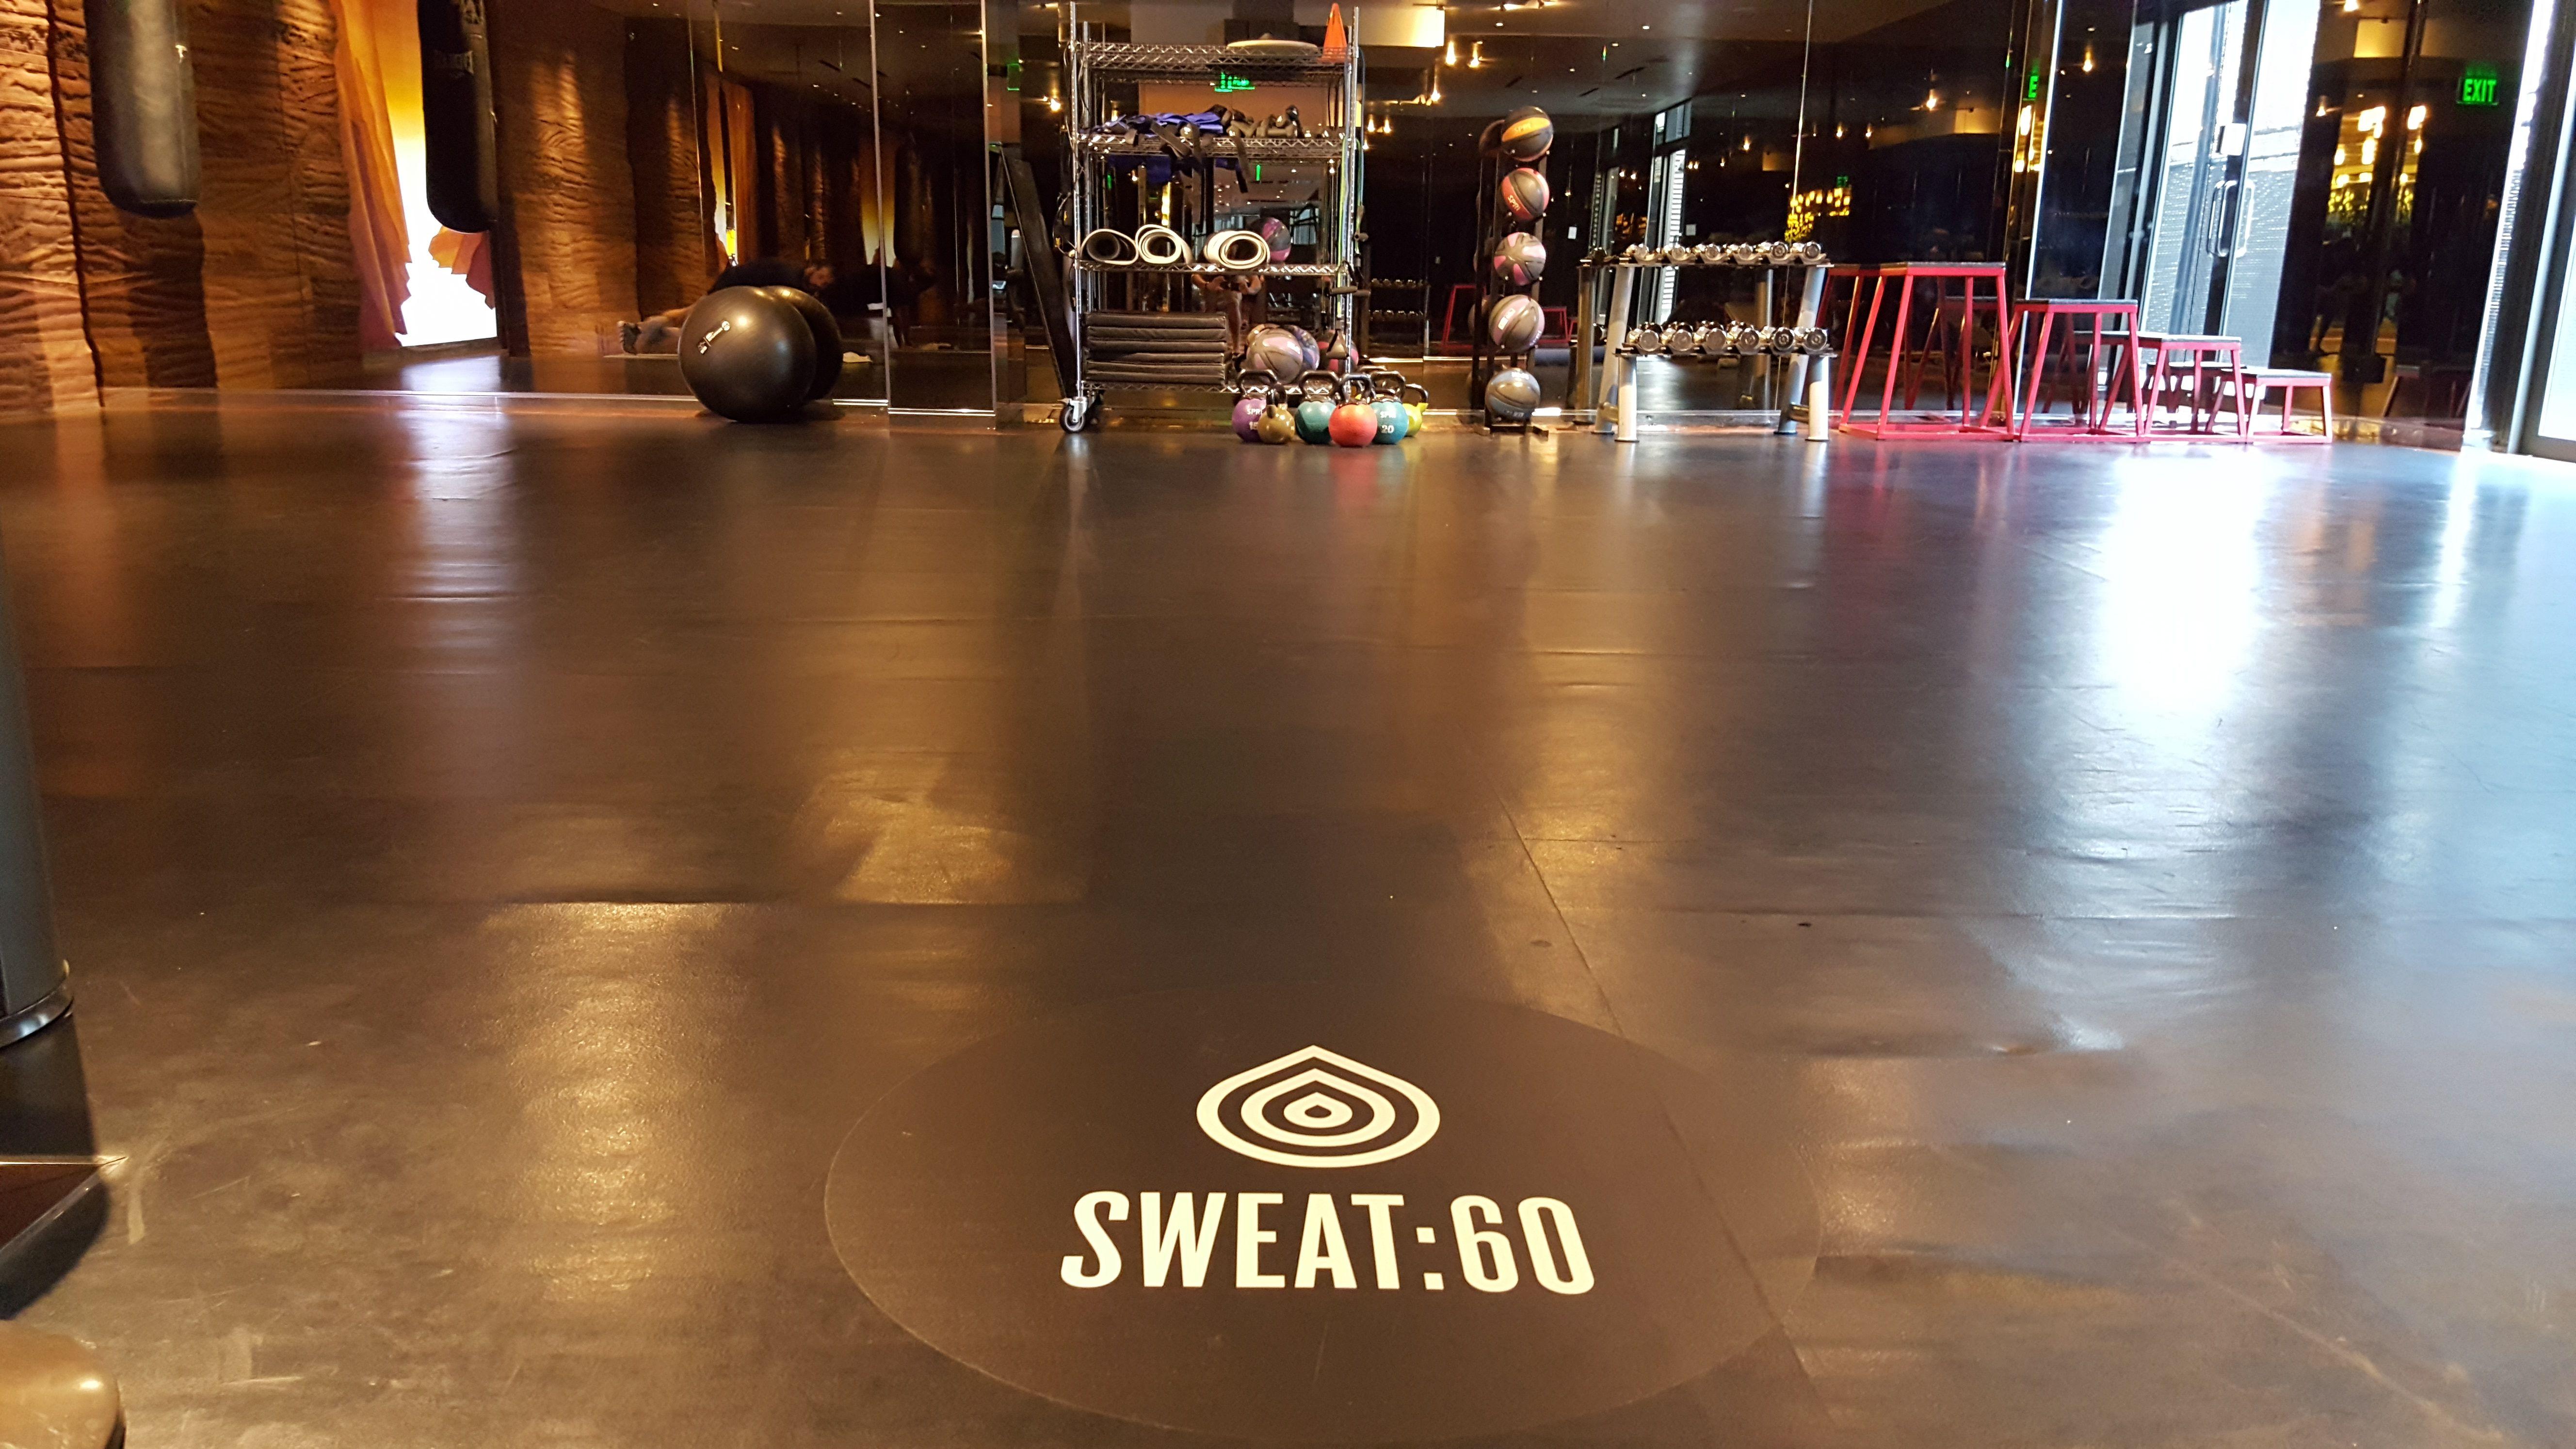 Sweat 60 en Cosmopolitan Las Vegas